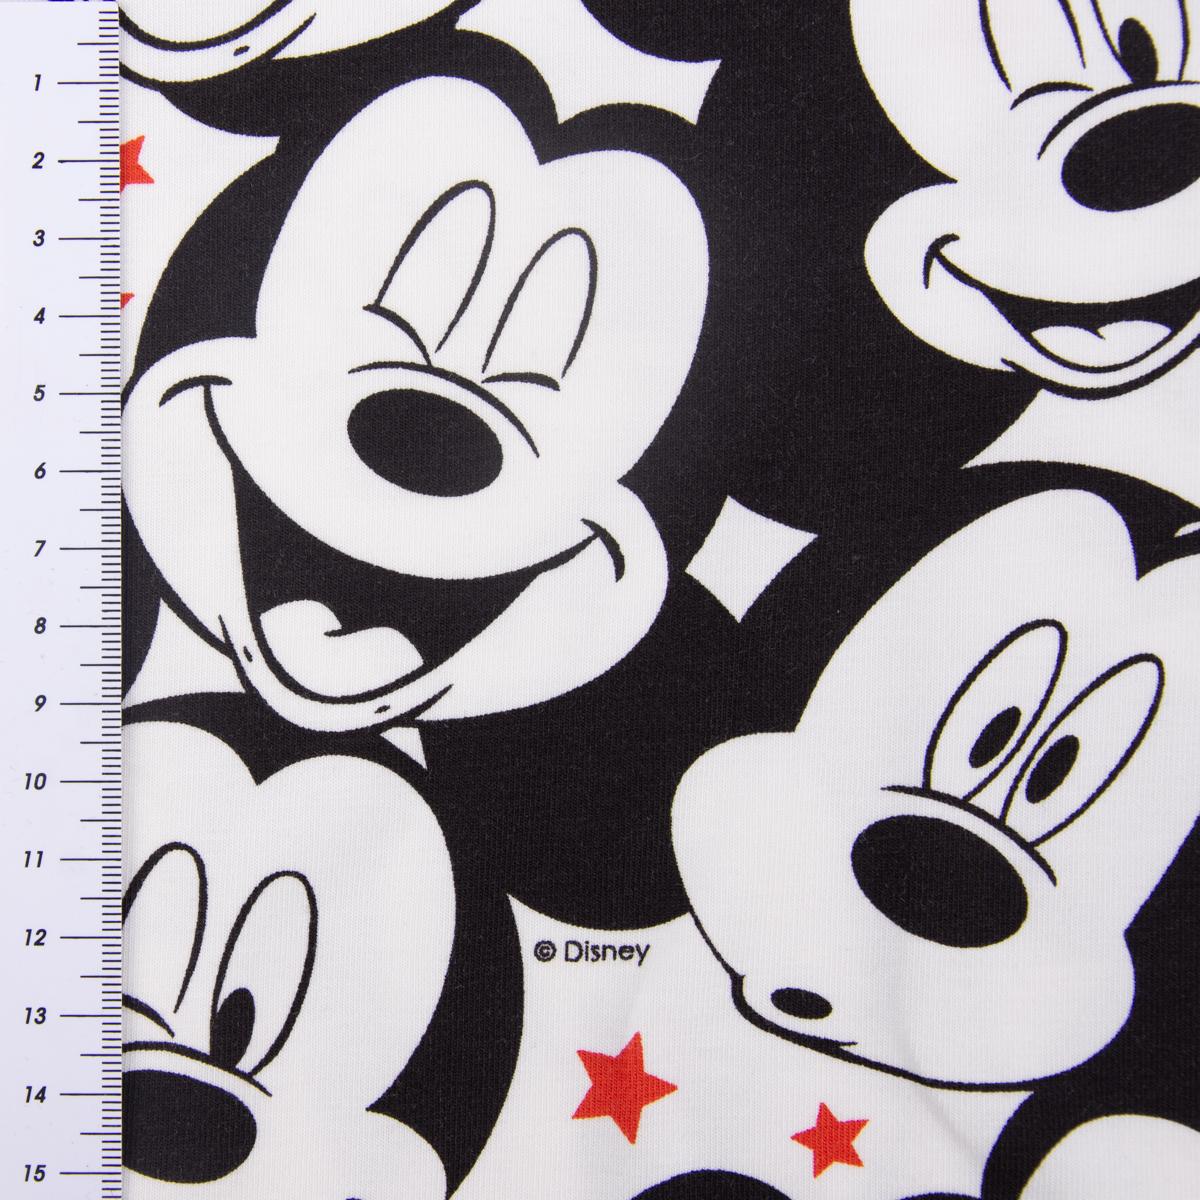 baumwolljersey jersey disney micky maus sterne wei schwarz rot 1 50m breite alle stoffe stoffe. Black Bedroom Furniture Sets. Home Design Ideas